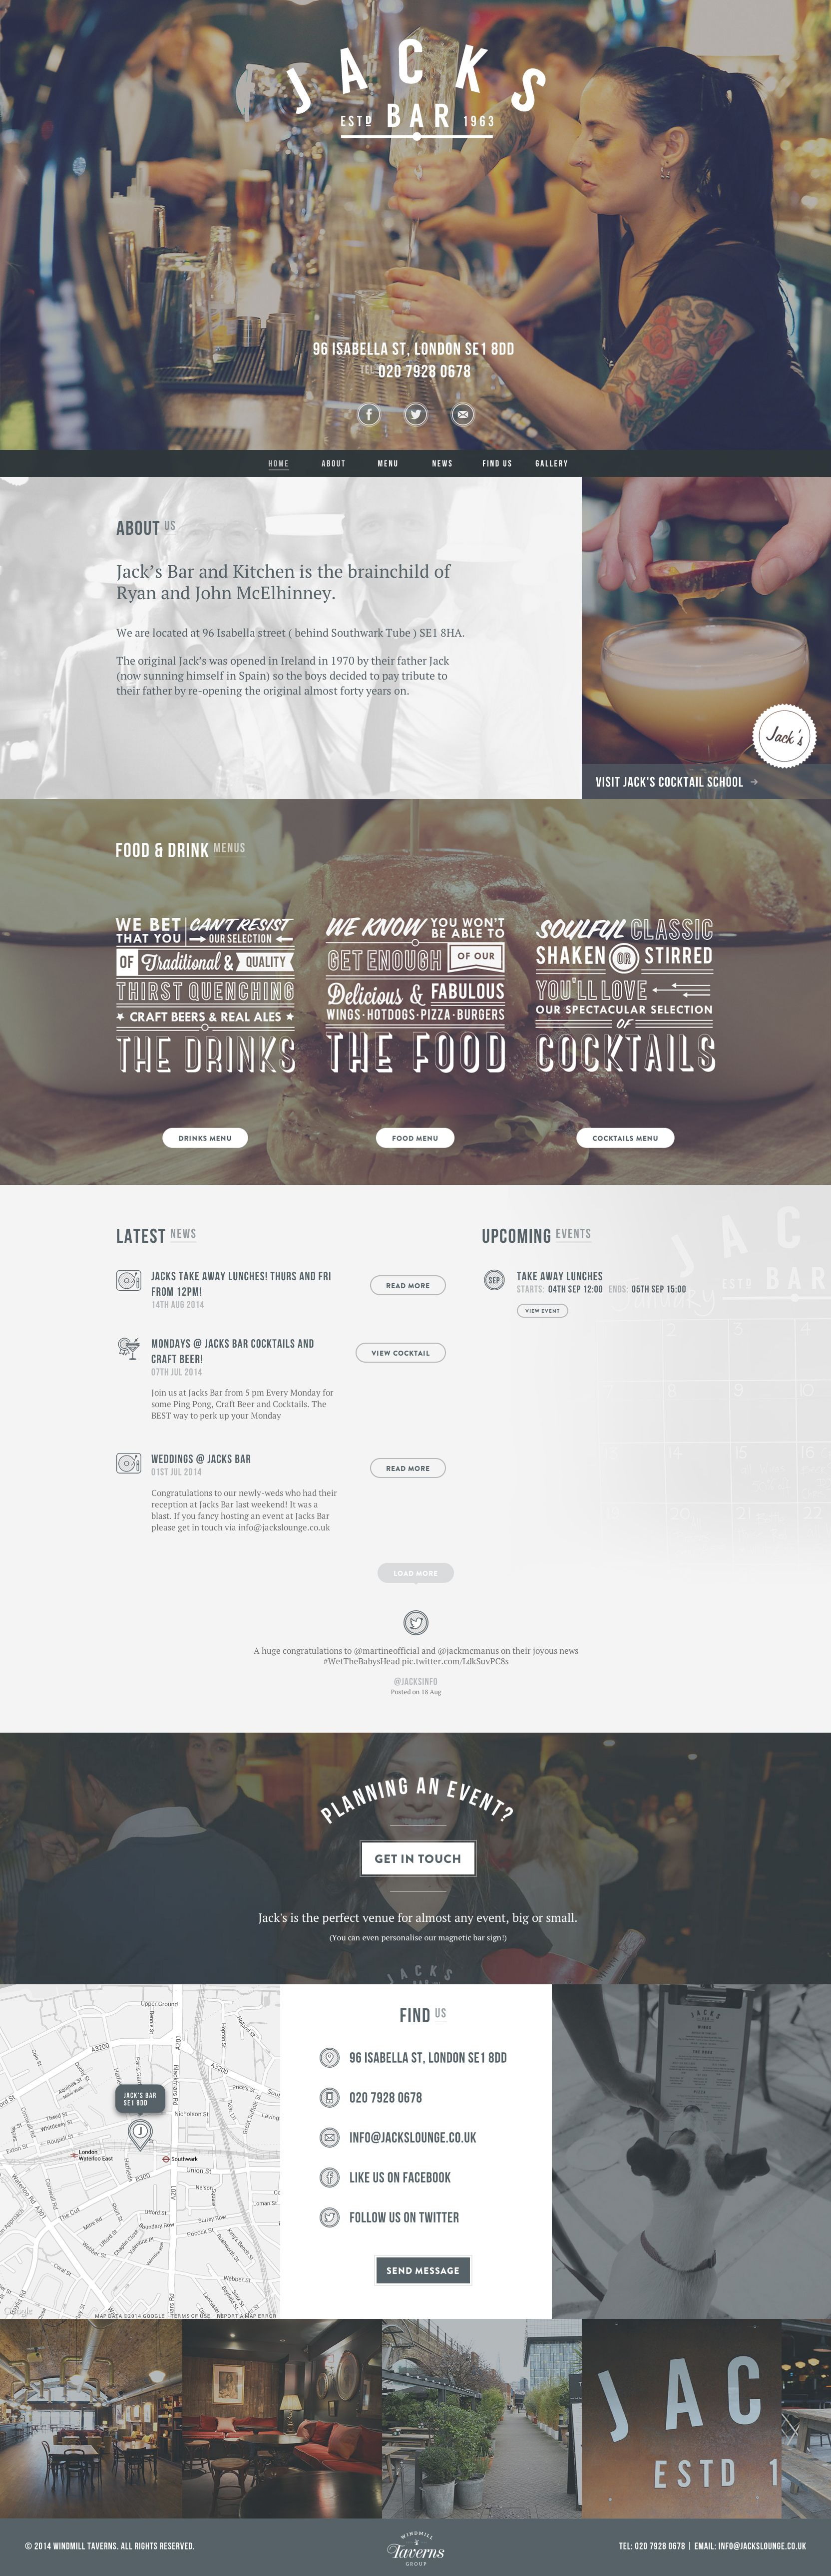 Gorgeous website!! Jacks Bar - London http://jacksbarlondon.co.uk/